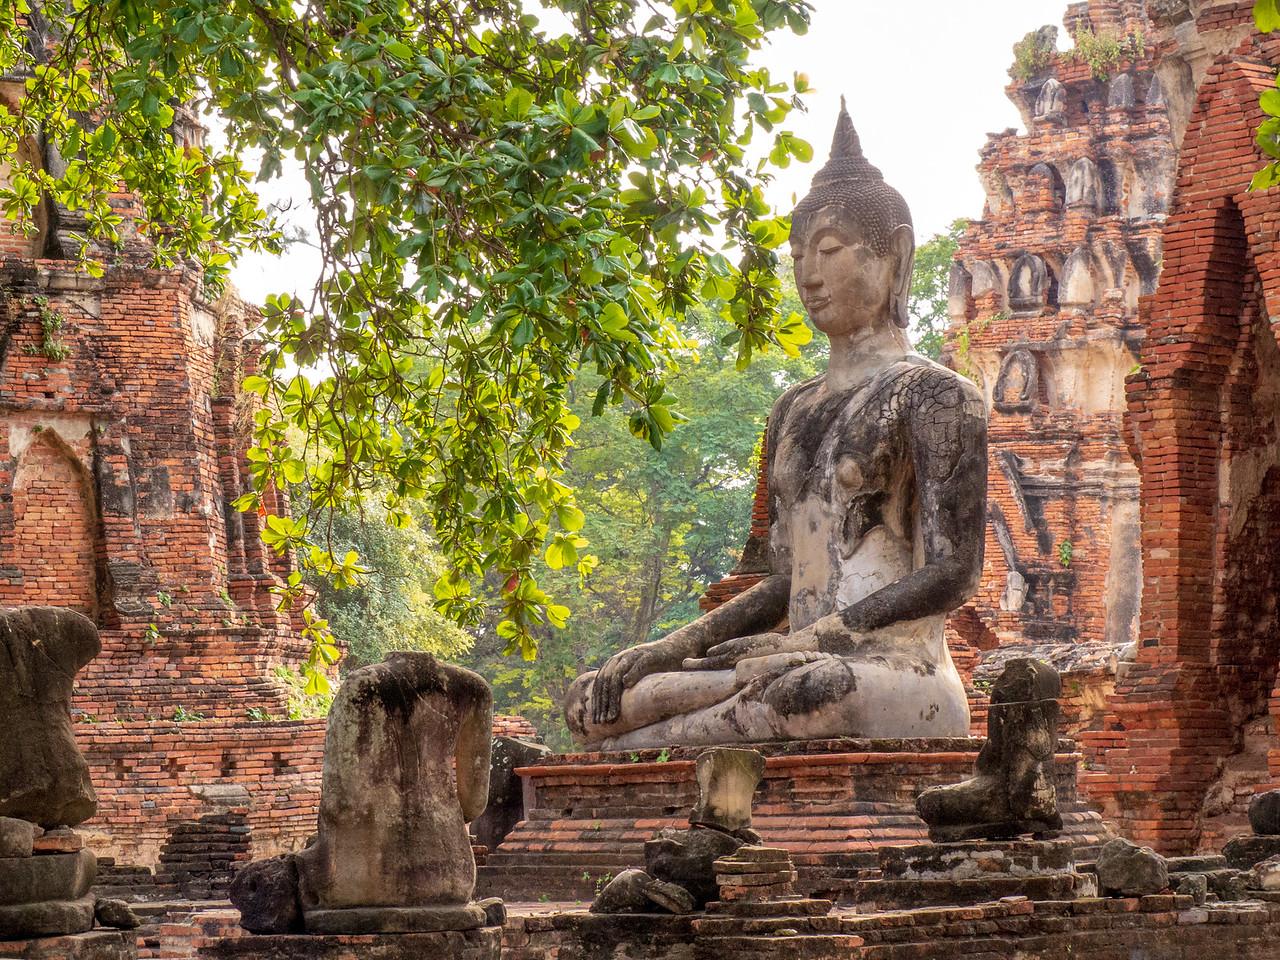 Photo: Wat Mahathat UNESCO World Heritage Site